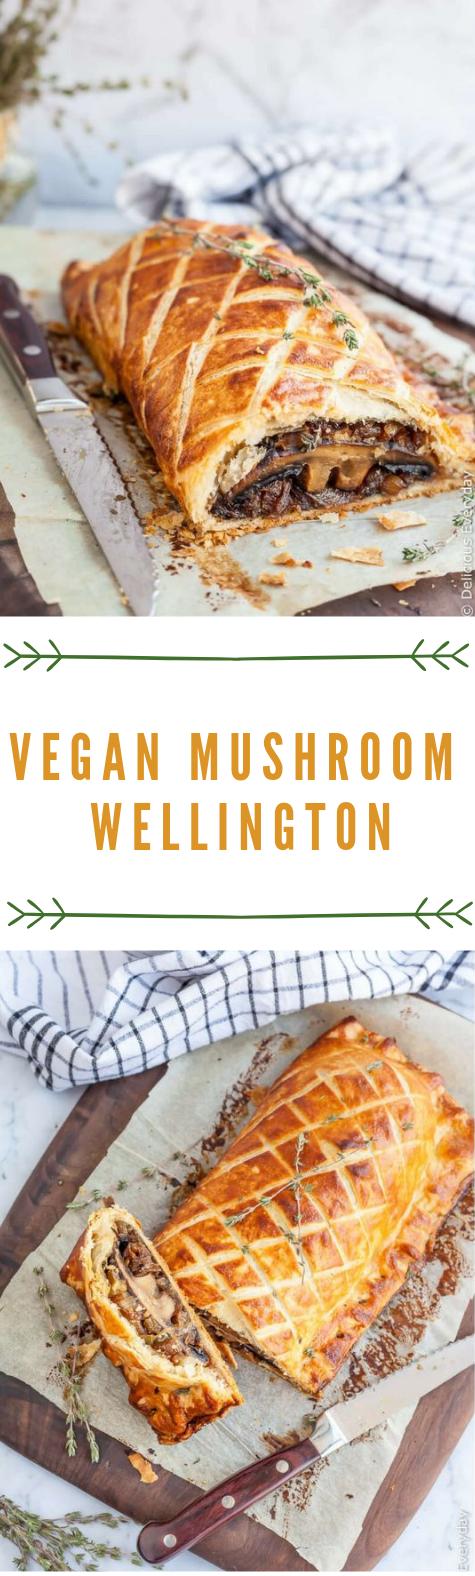 Vegan Mushroom Wellington Recipe #vegan #mushroom